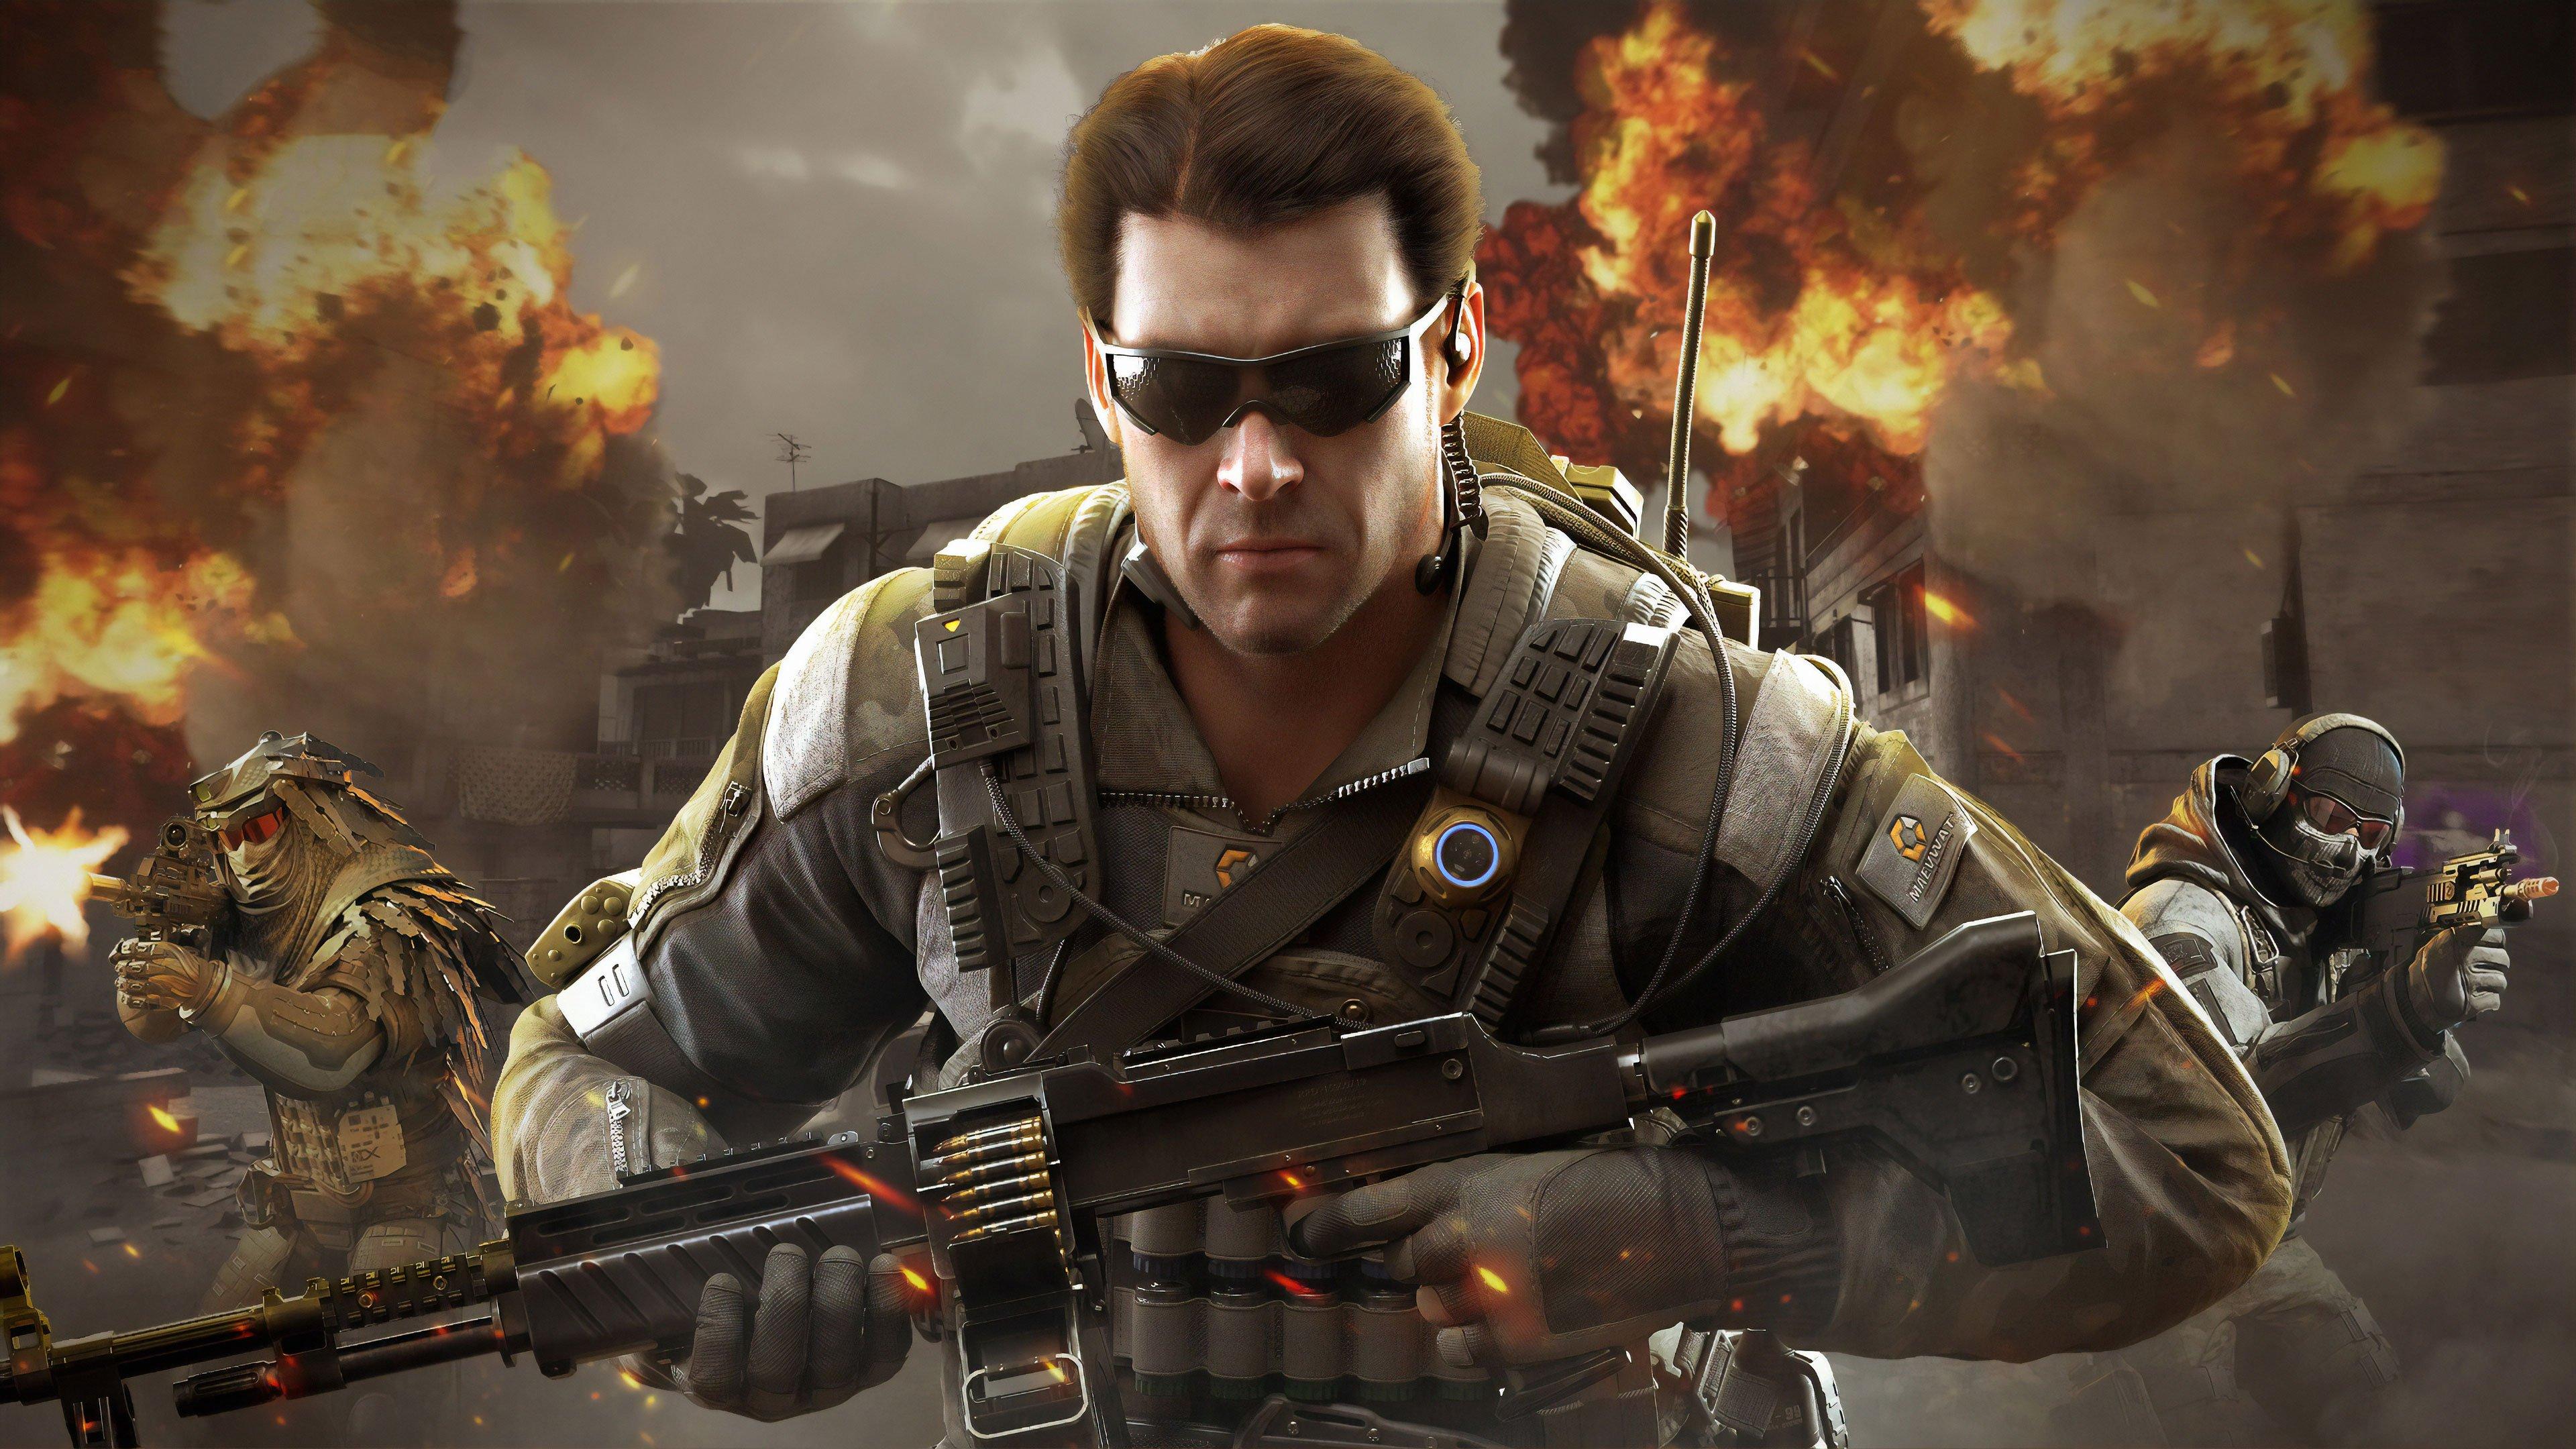 Call Of Duty Mobile Wallpaper 4k Ultra Hd Id 4008